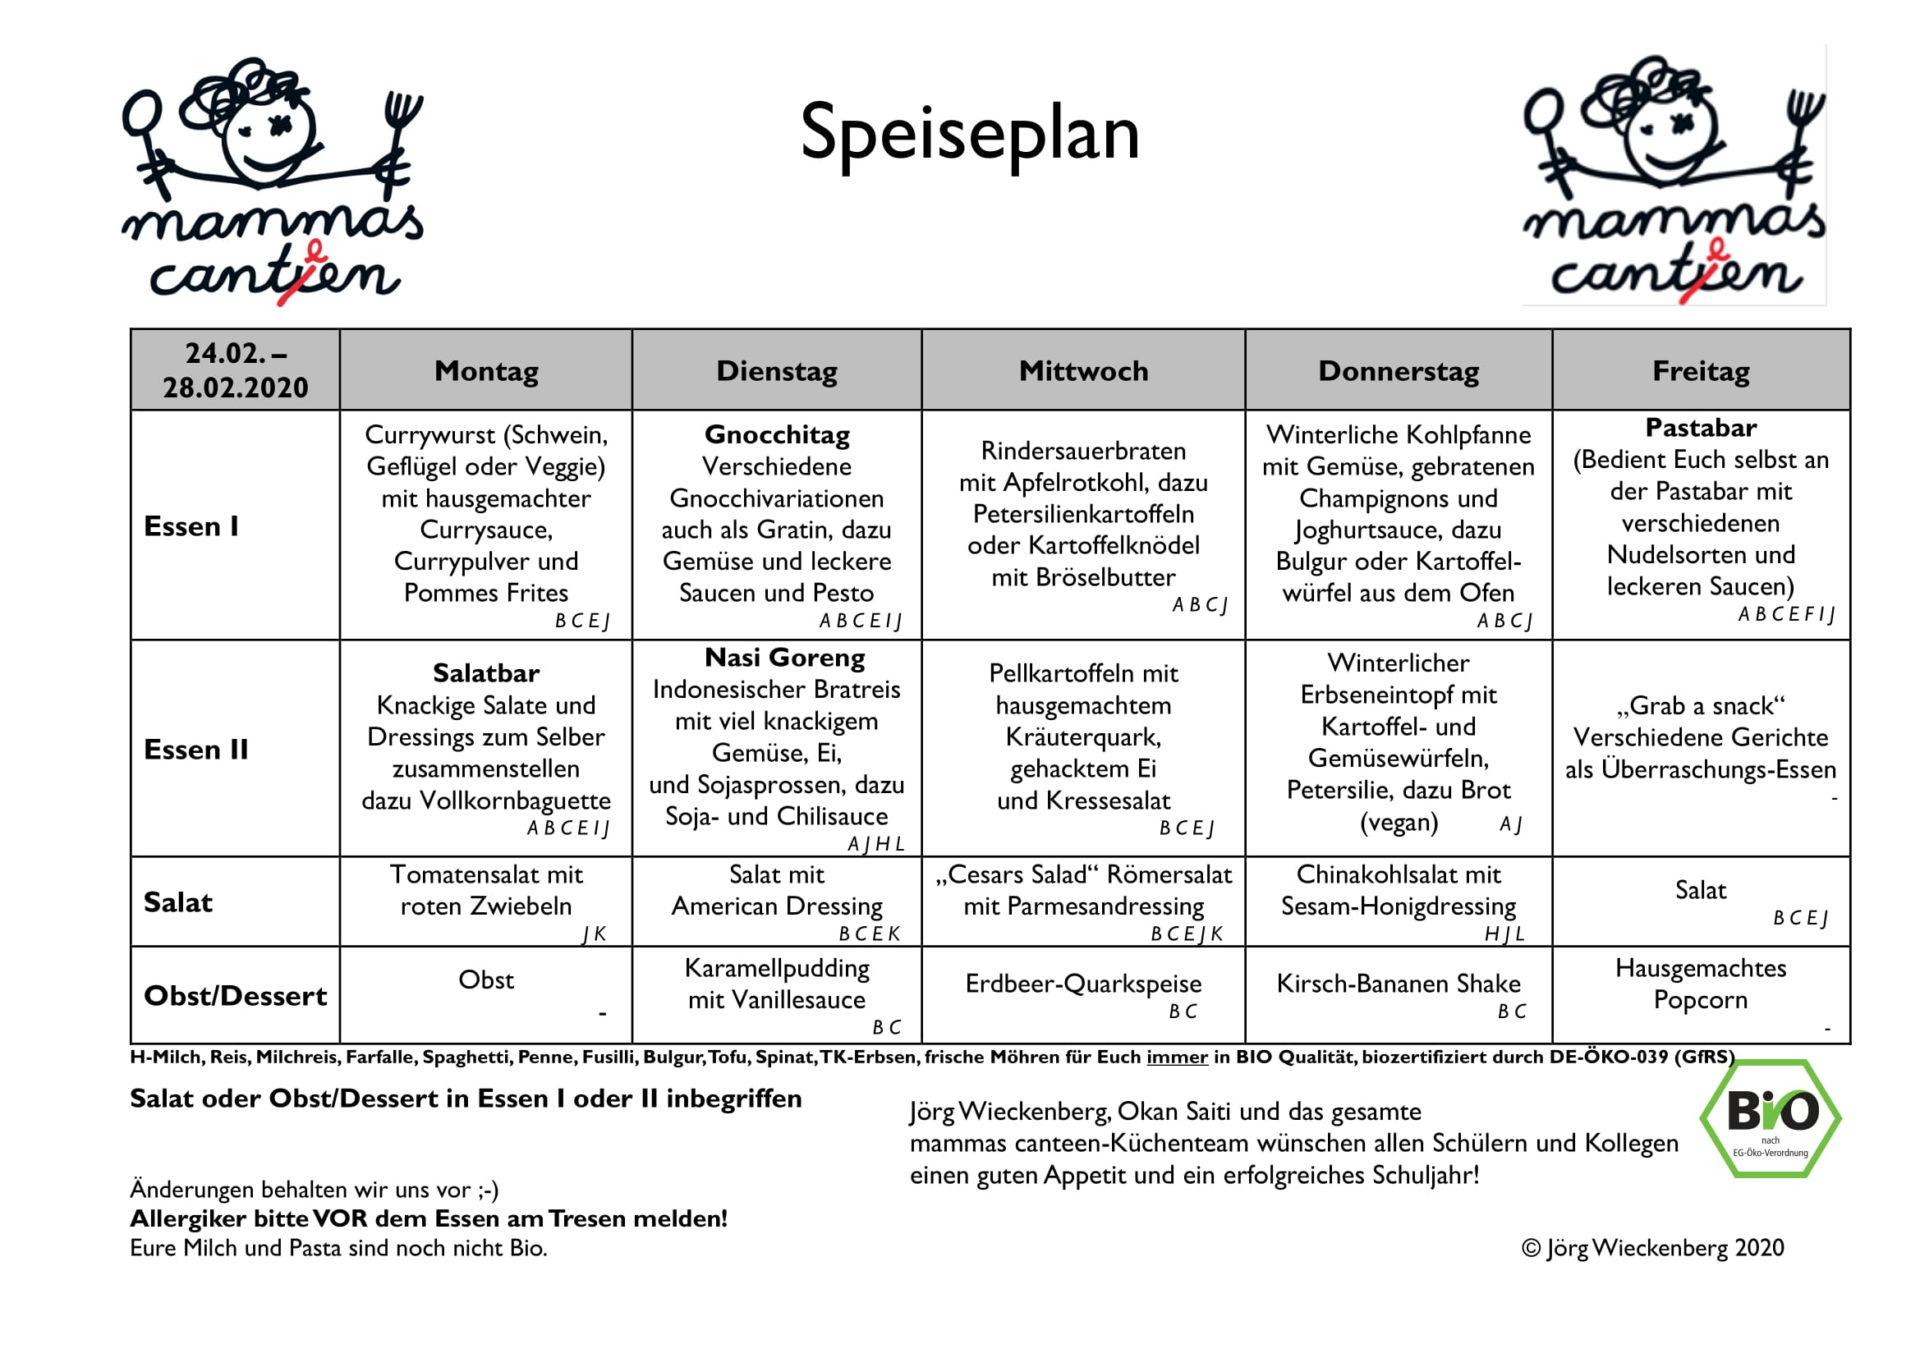 mammas canteen Speiseplan 24.02. 28.02.2020-1